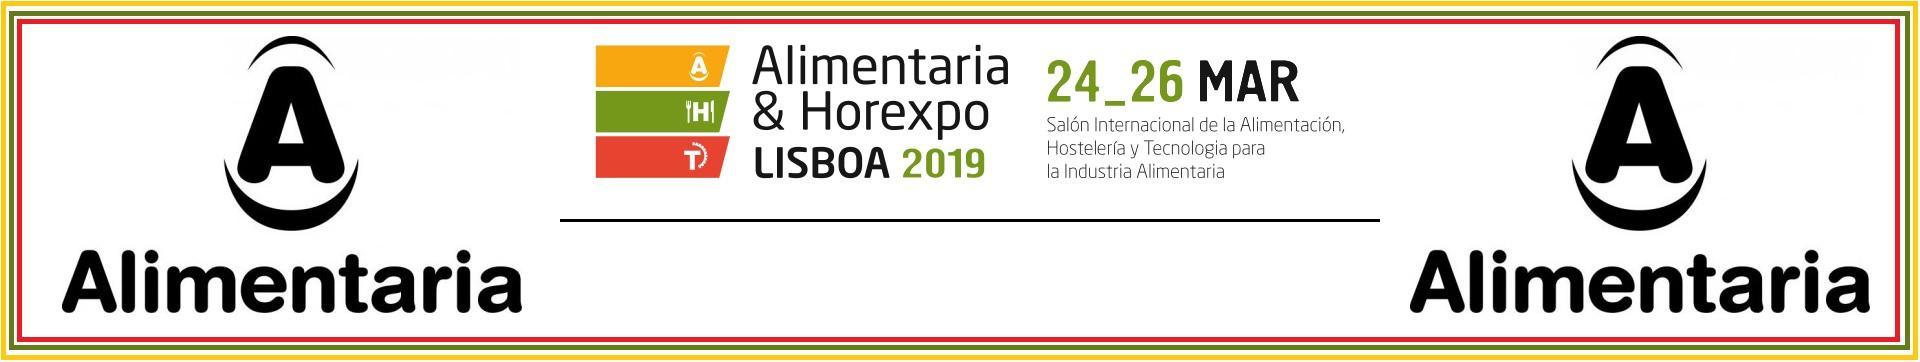 ALIMENTARIA & HOREXPO PORTUGAL 2019